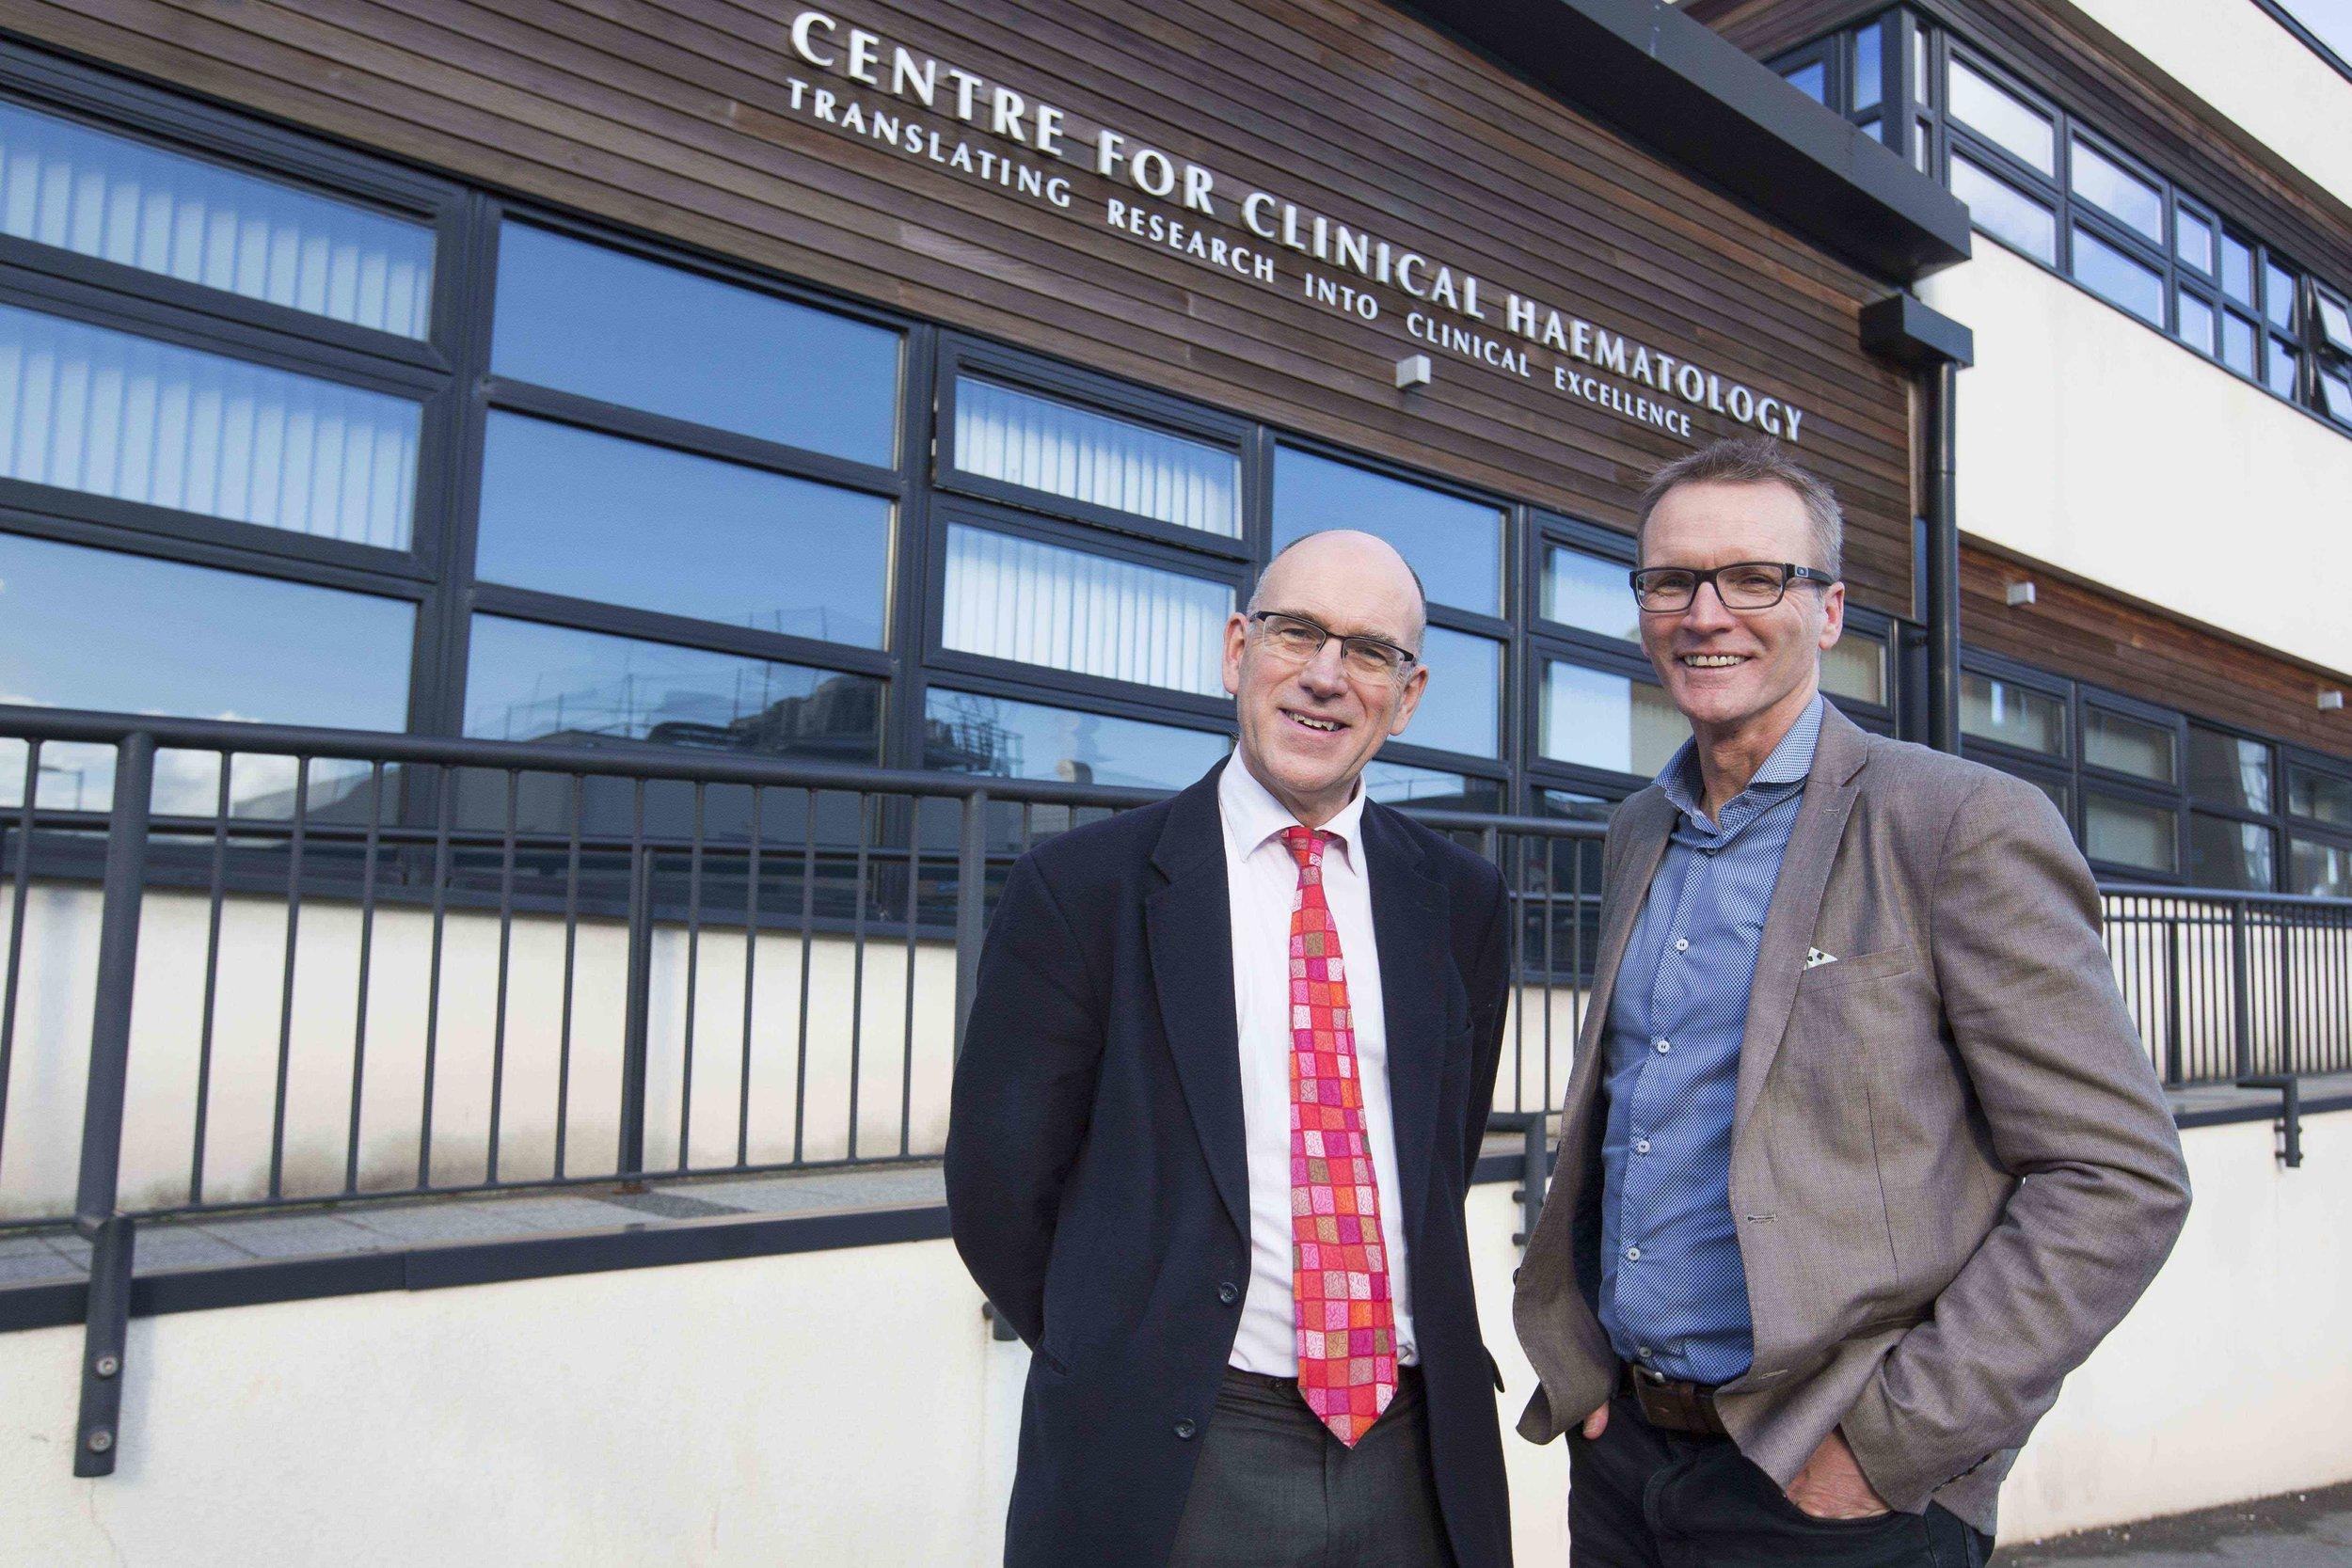 Professor Charlie Craddock CBE (left) and Geoff Thomas (right)